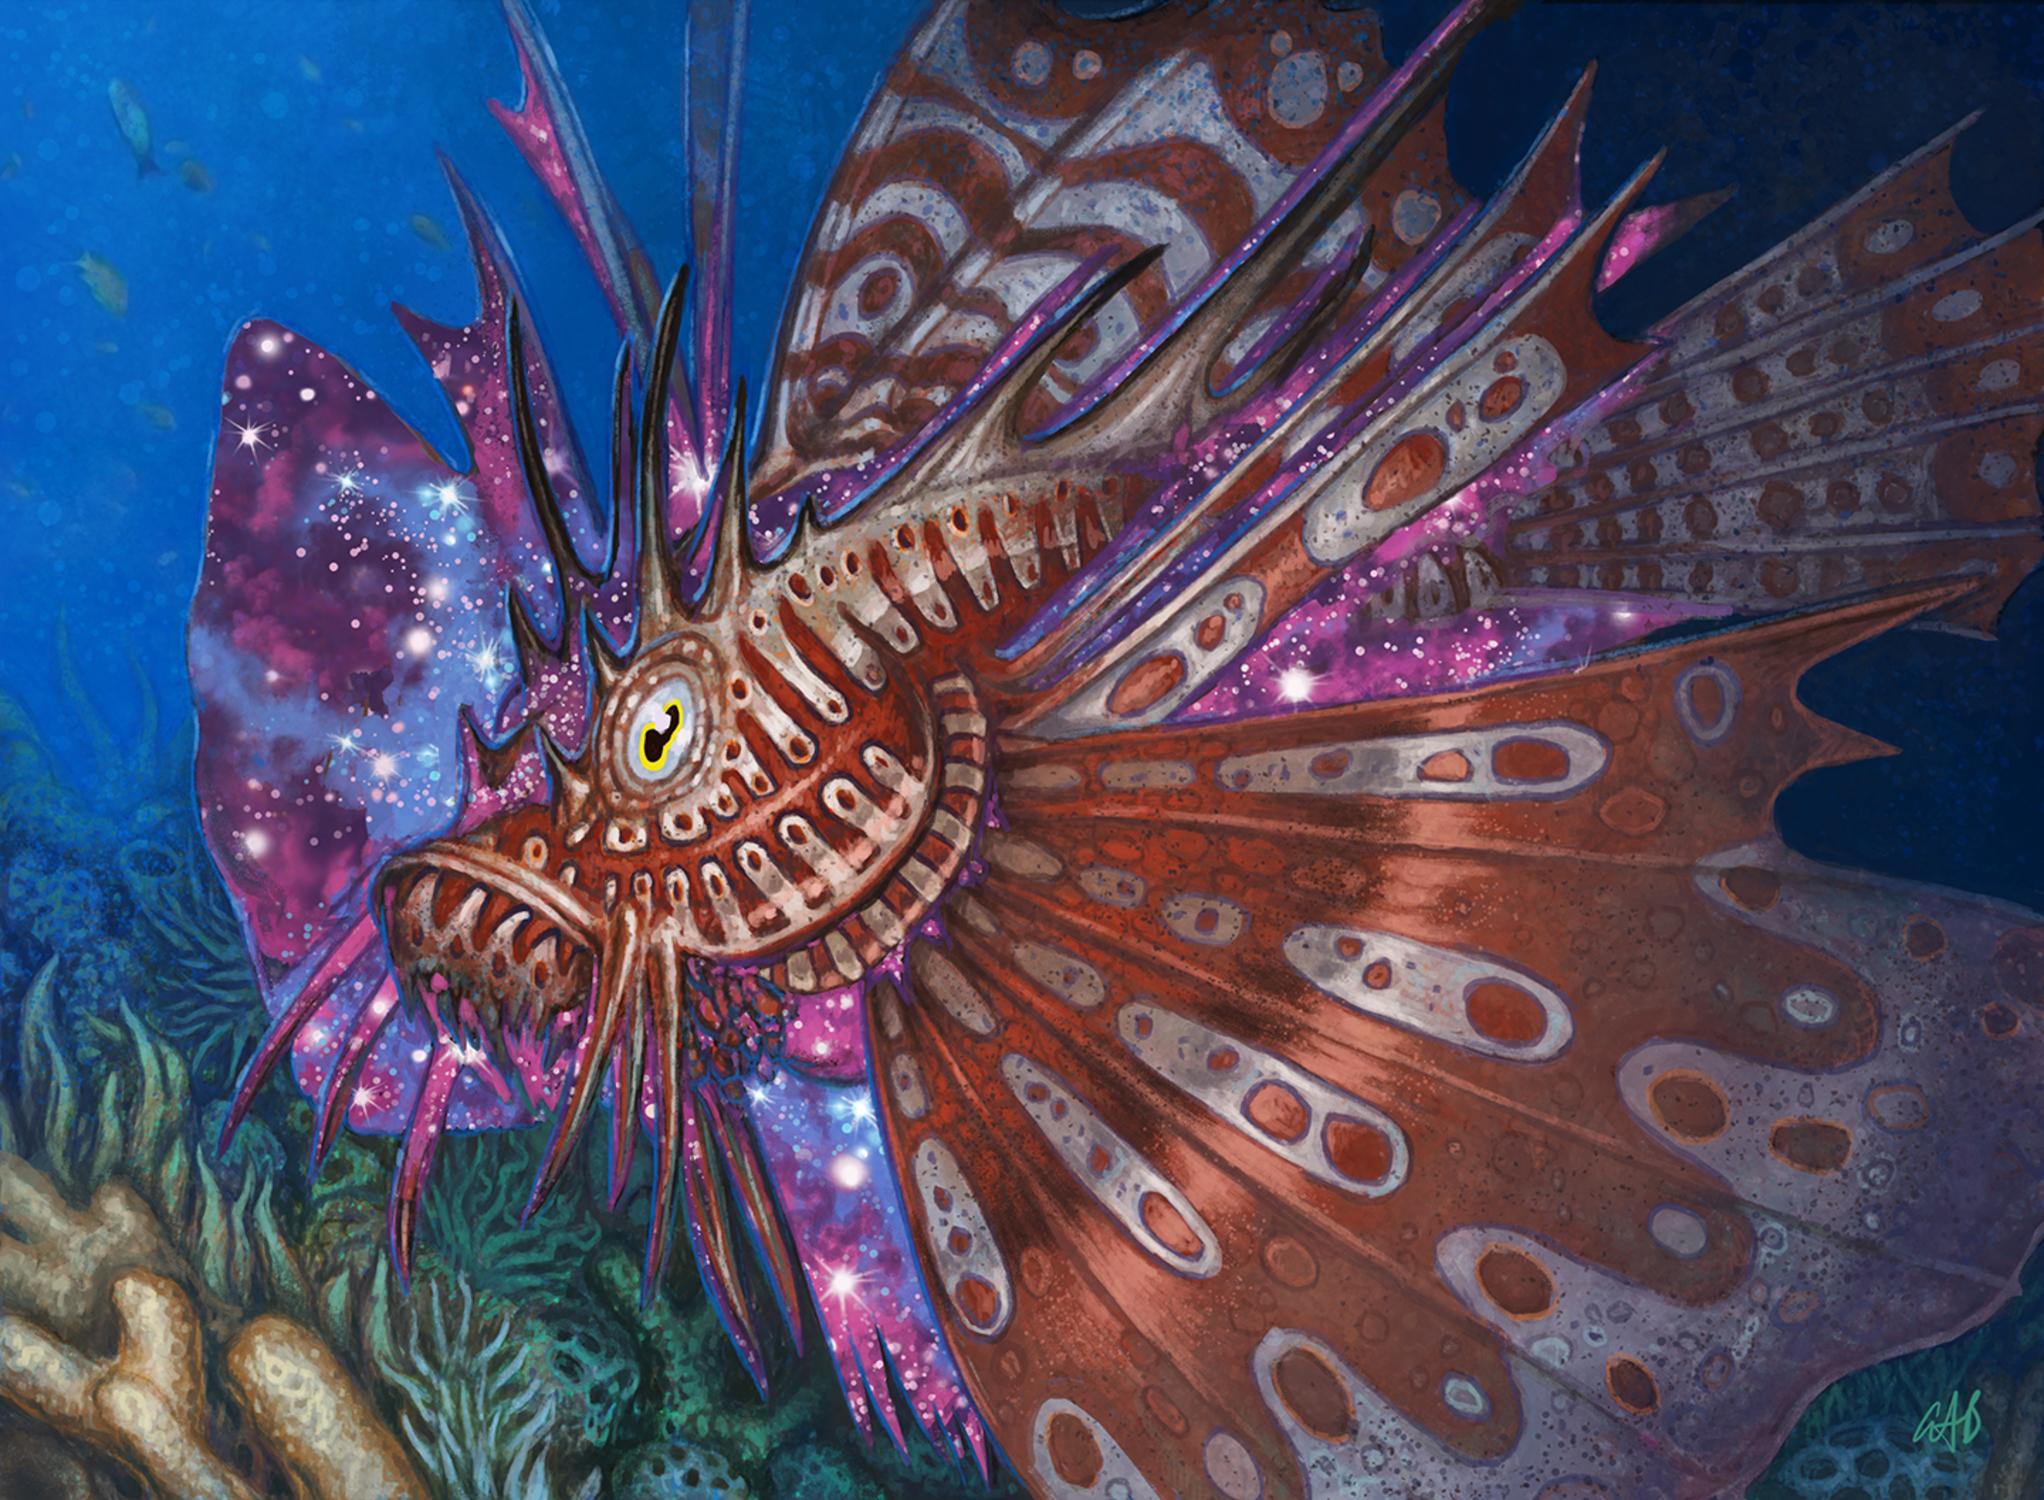 Stinging Lionfish Artwork by Christopher Burdett